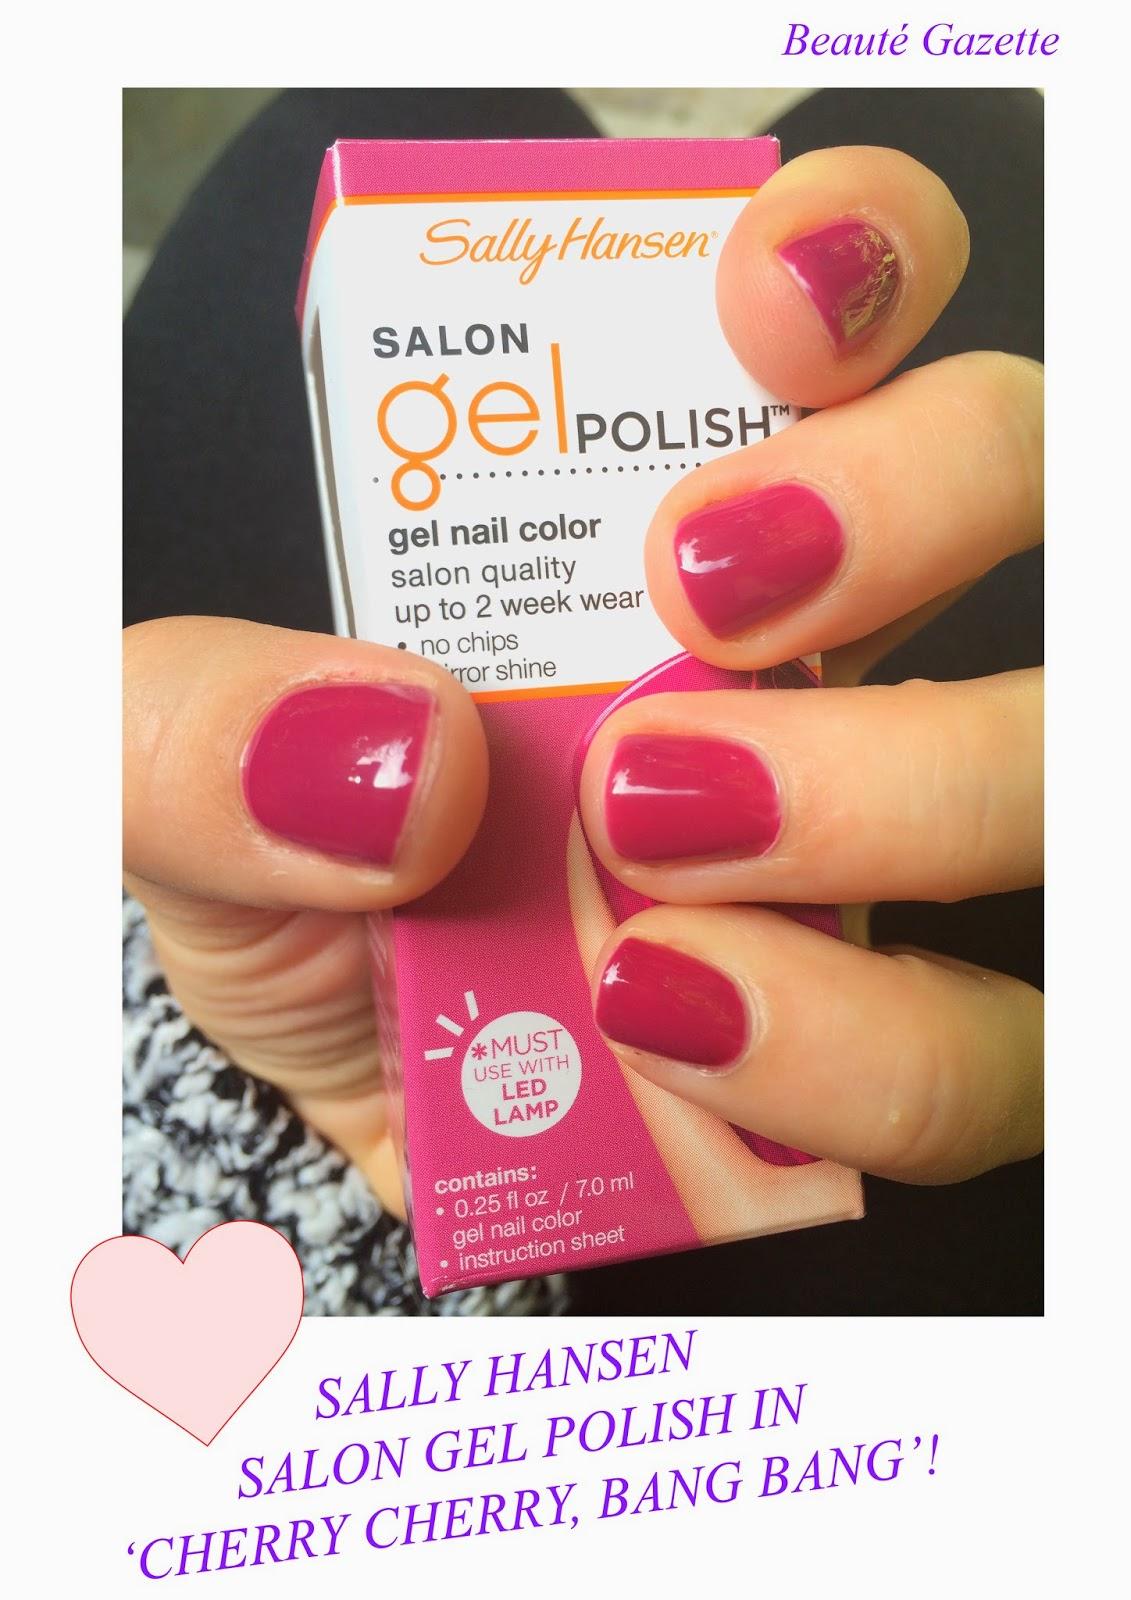 Beaute Gazette Diy Gel Nails Sally Hansen Salon Gel